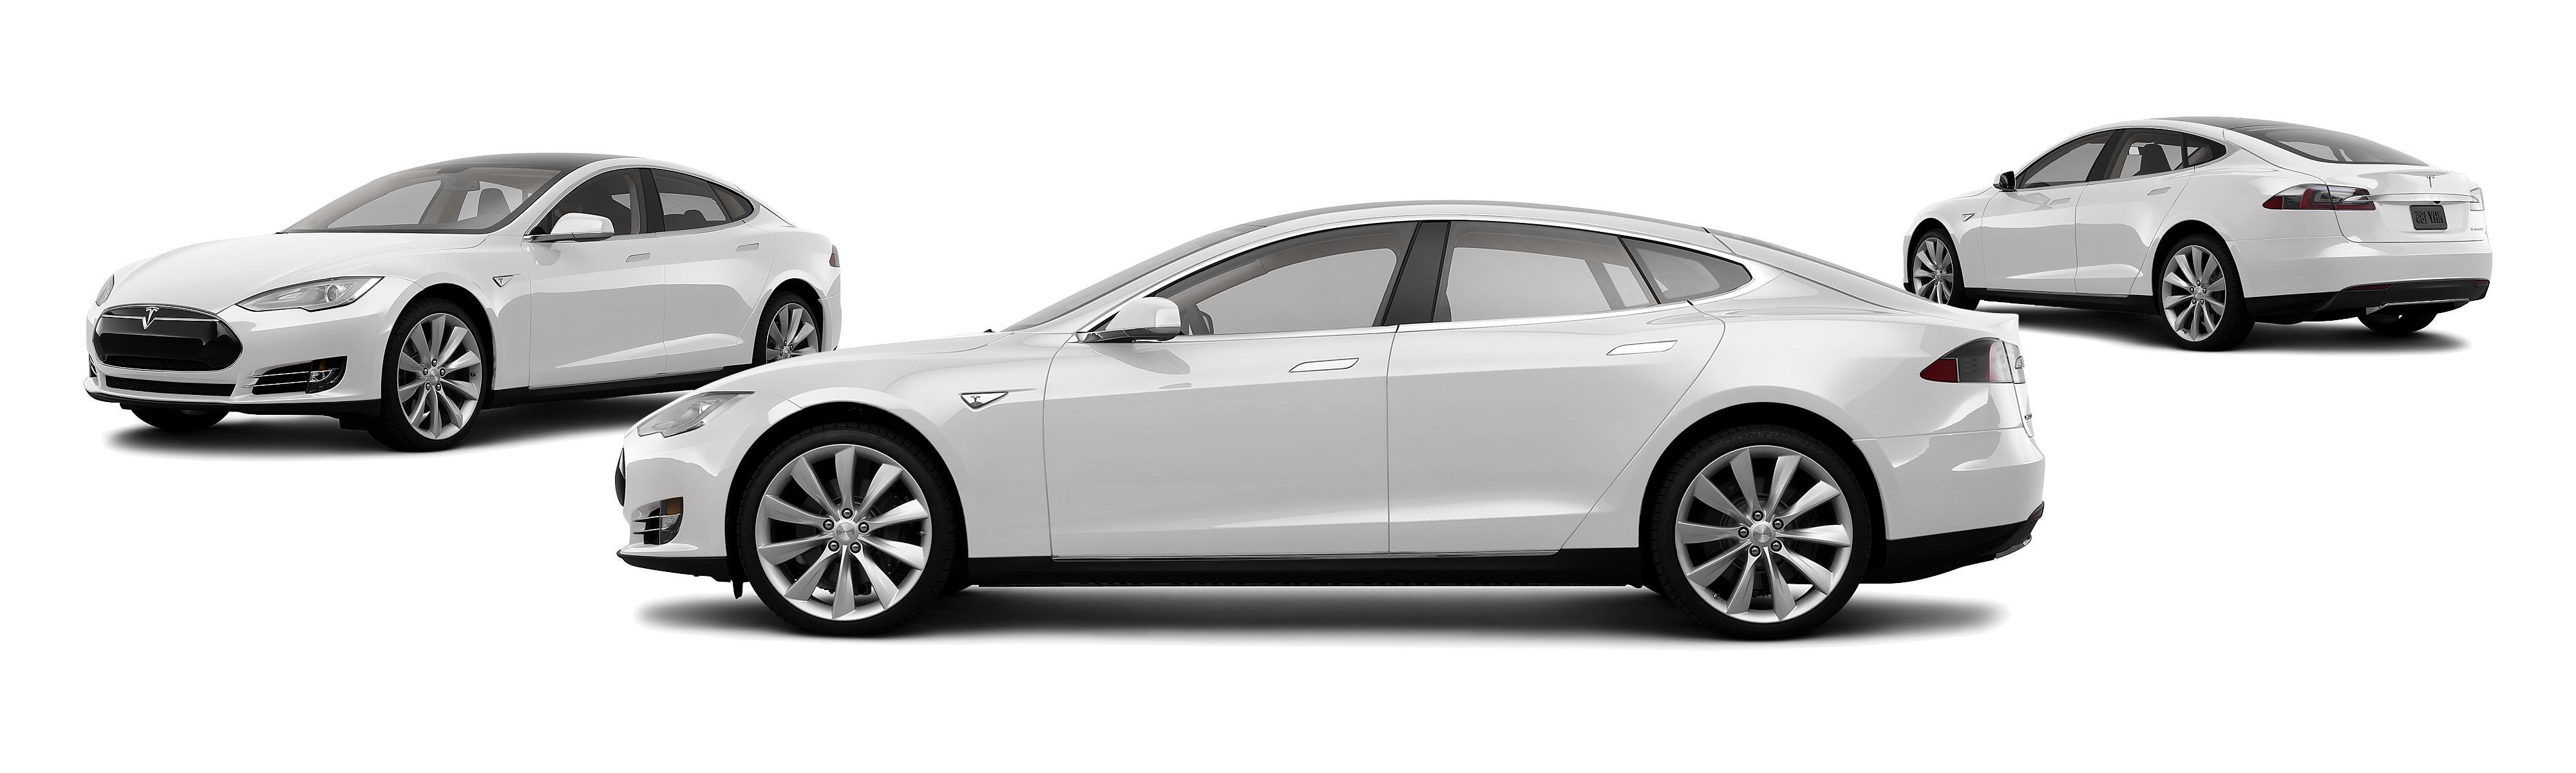 Tesla Model S Base Dr Liftback KWh Research GrooveCar - 2013 tesla model s base